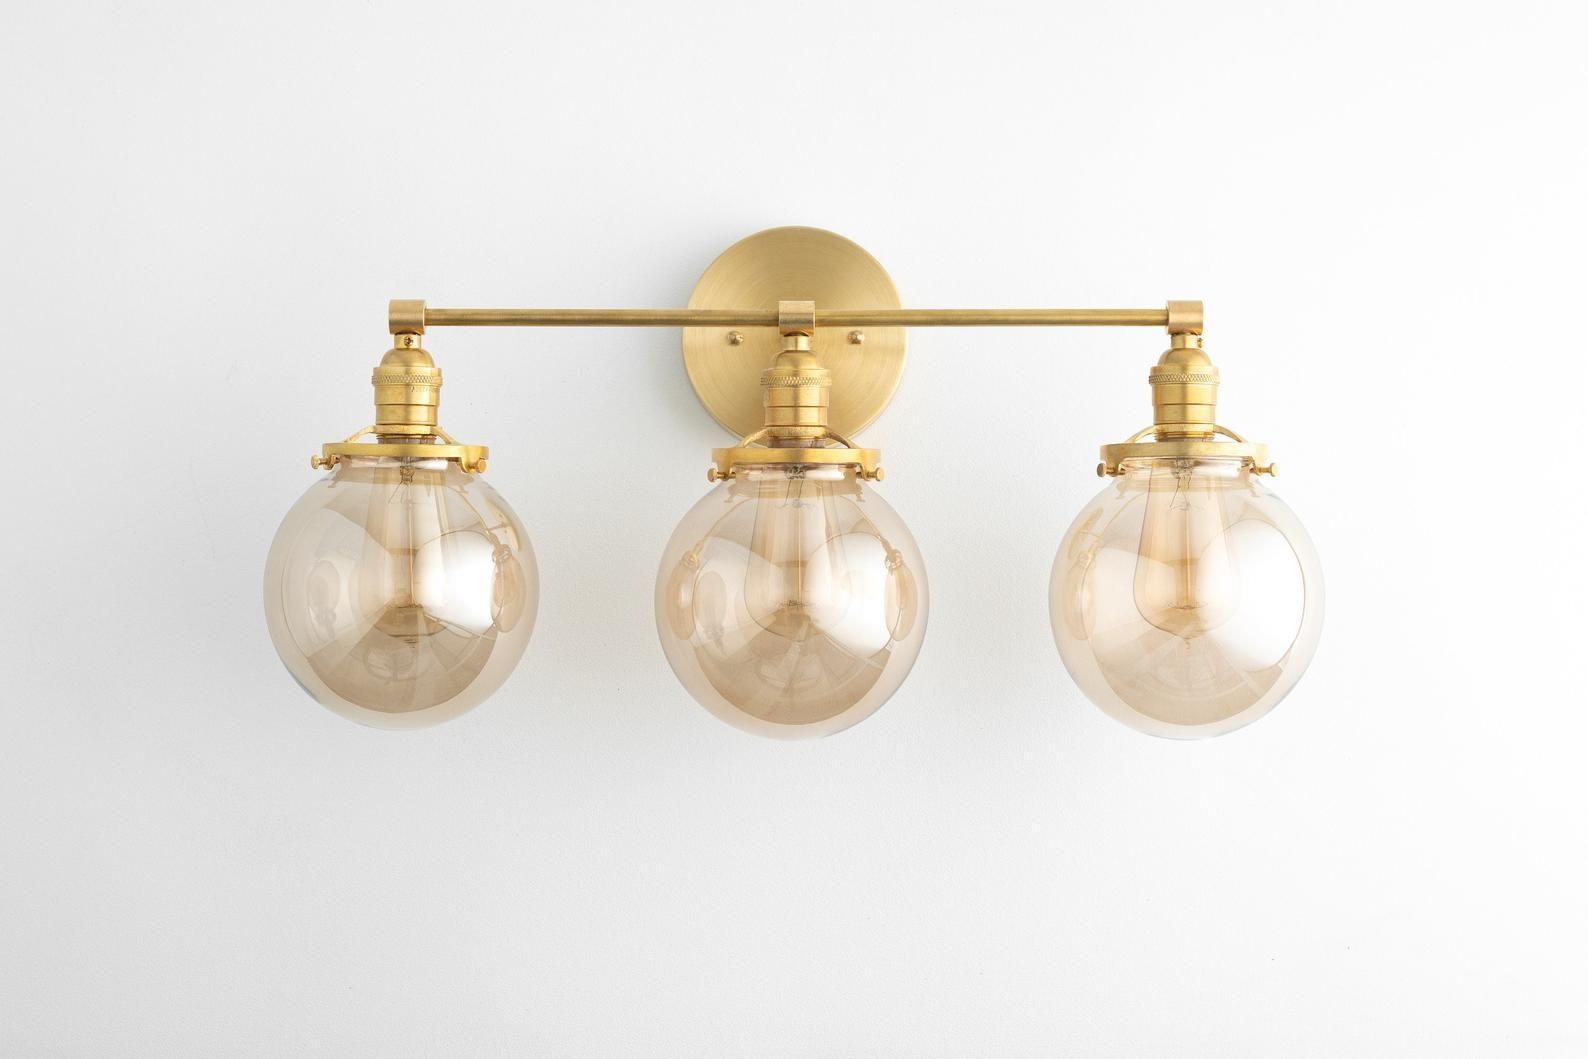 Vanity Lights Brass Vanity Lighting 3 Bulb Bathroom Lamps Etsy Bathroom Light Fixtures Brass Vanity Light Bathroom Lighting